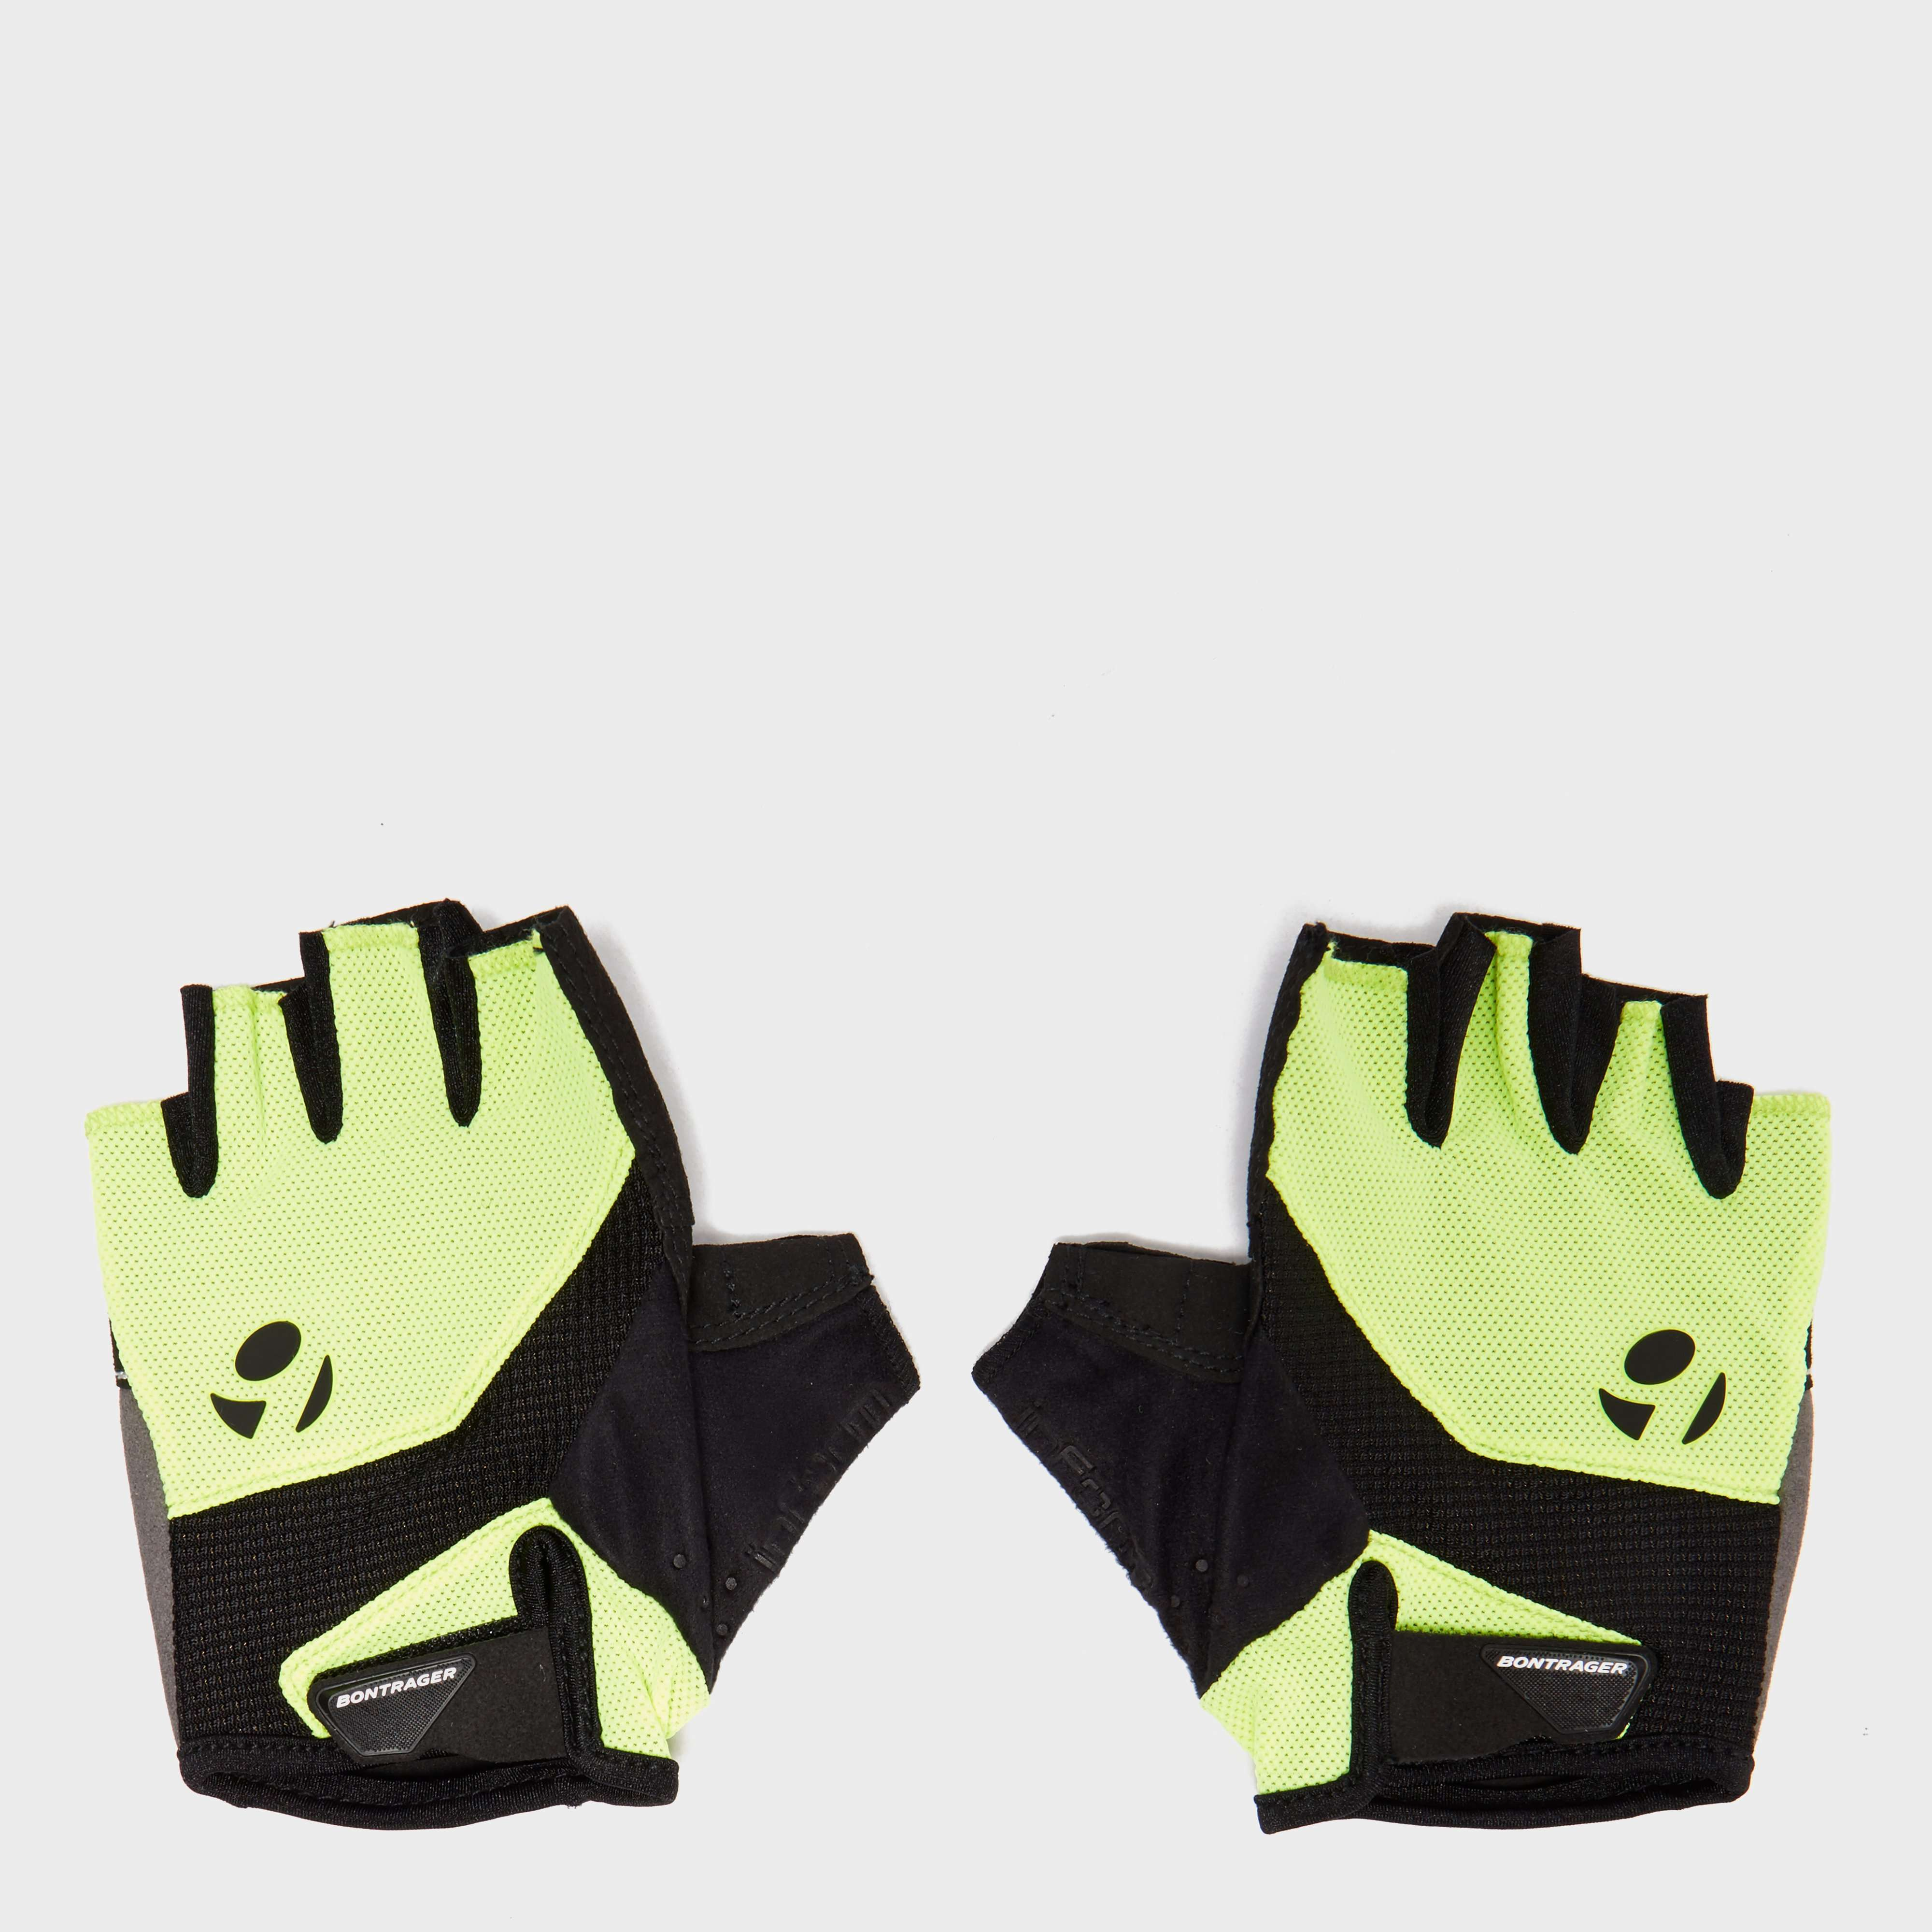 BONTRAGER Solstice Cyclist Gloves